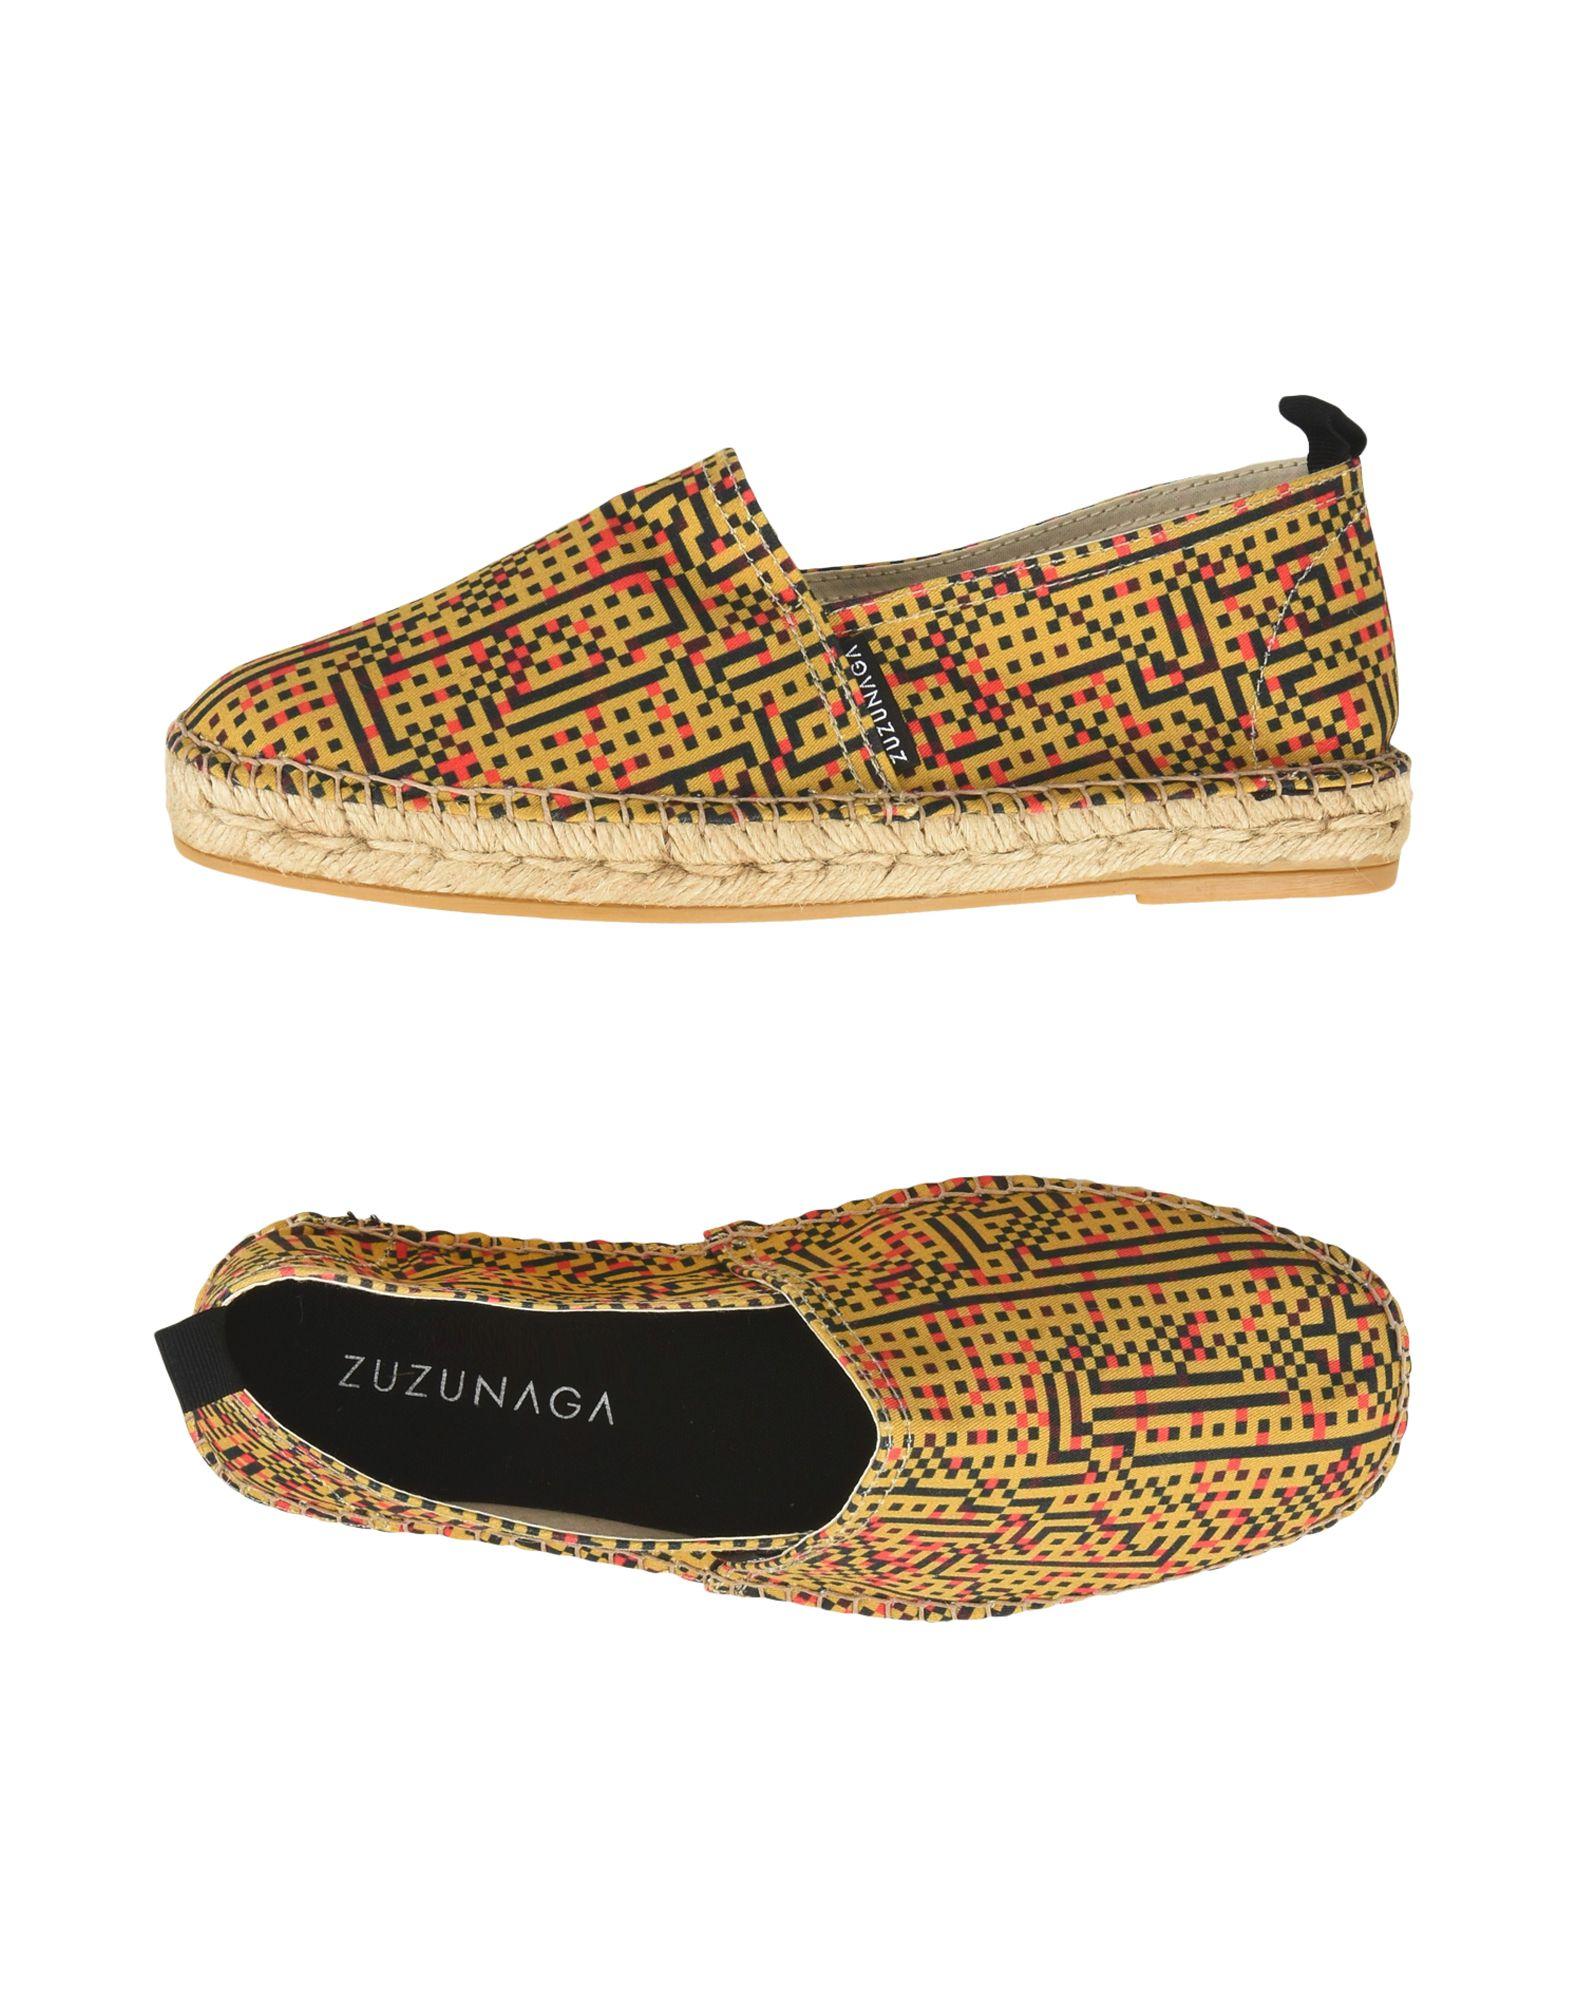 Zuzunaga Espadrilles Damen  11279309DA Gute Qualität beliebte Schuhe